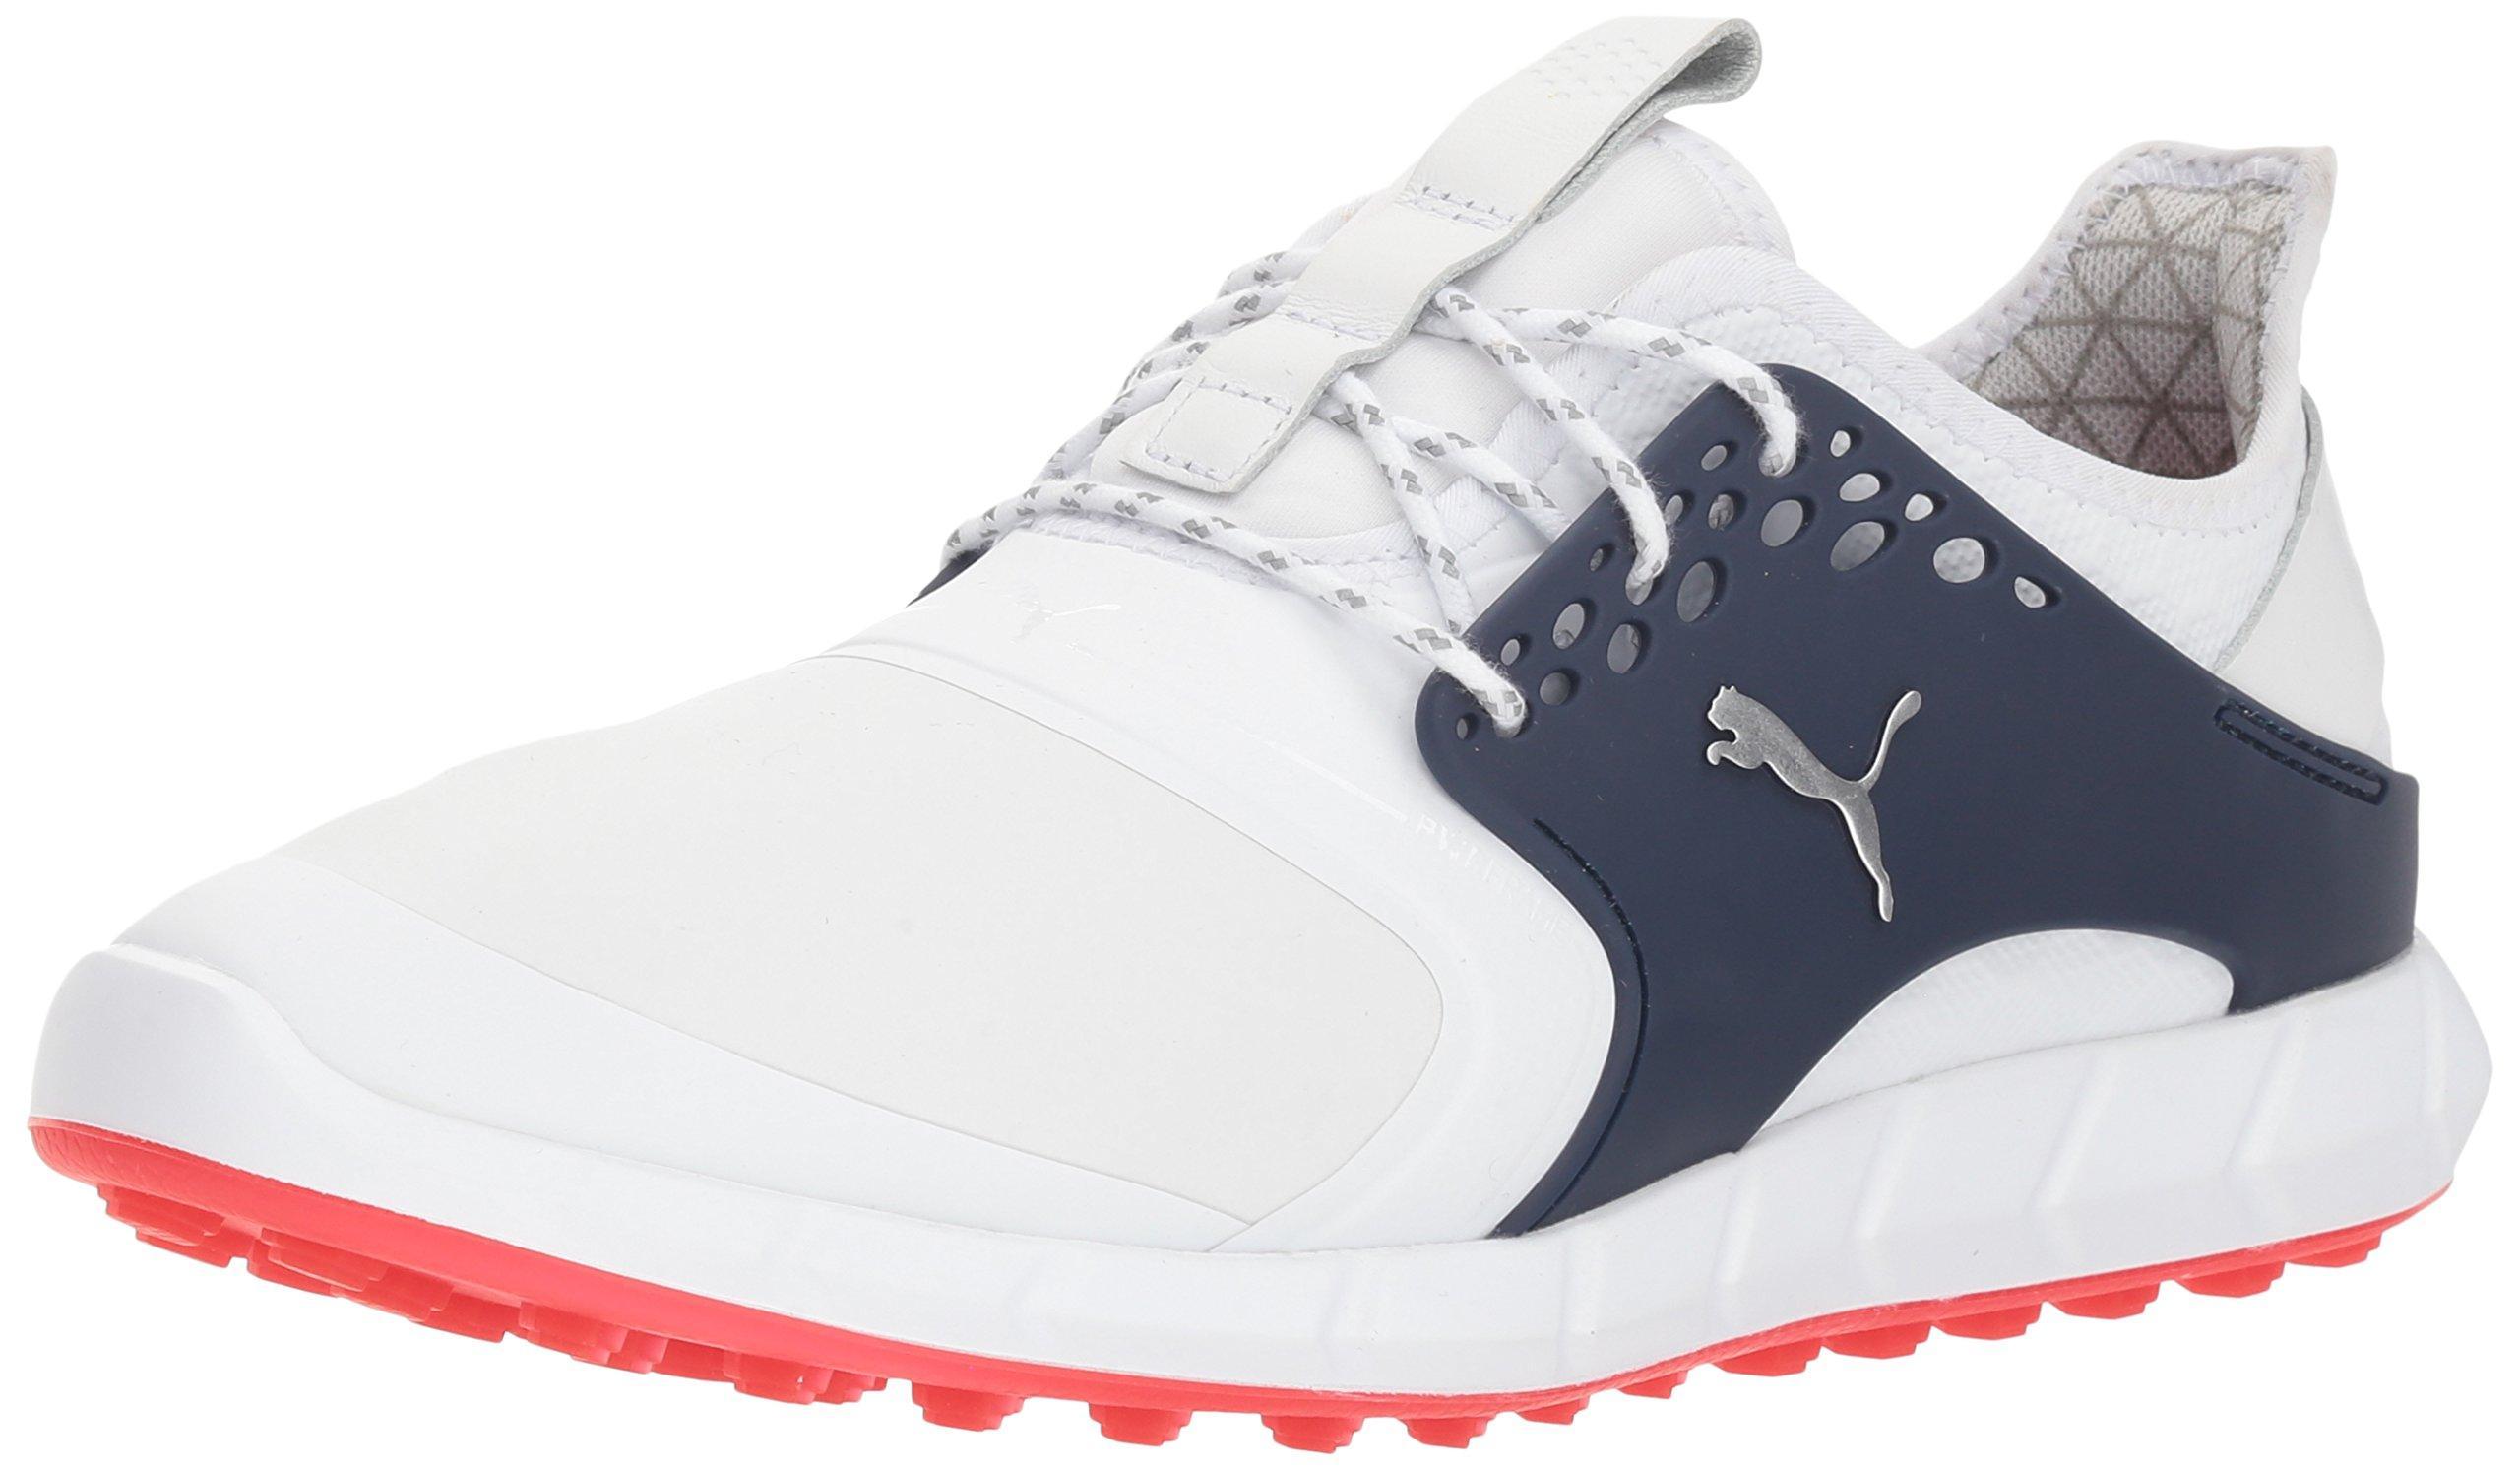 PUMA Golf Ignite Pwrsport Pro Golf Shoe